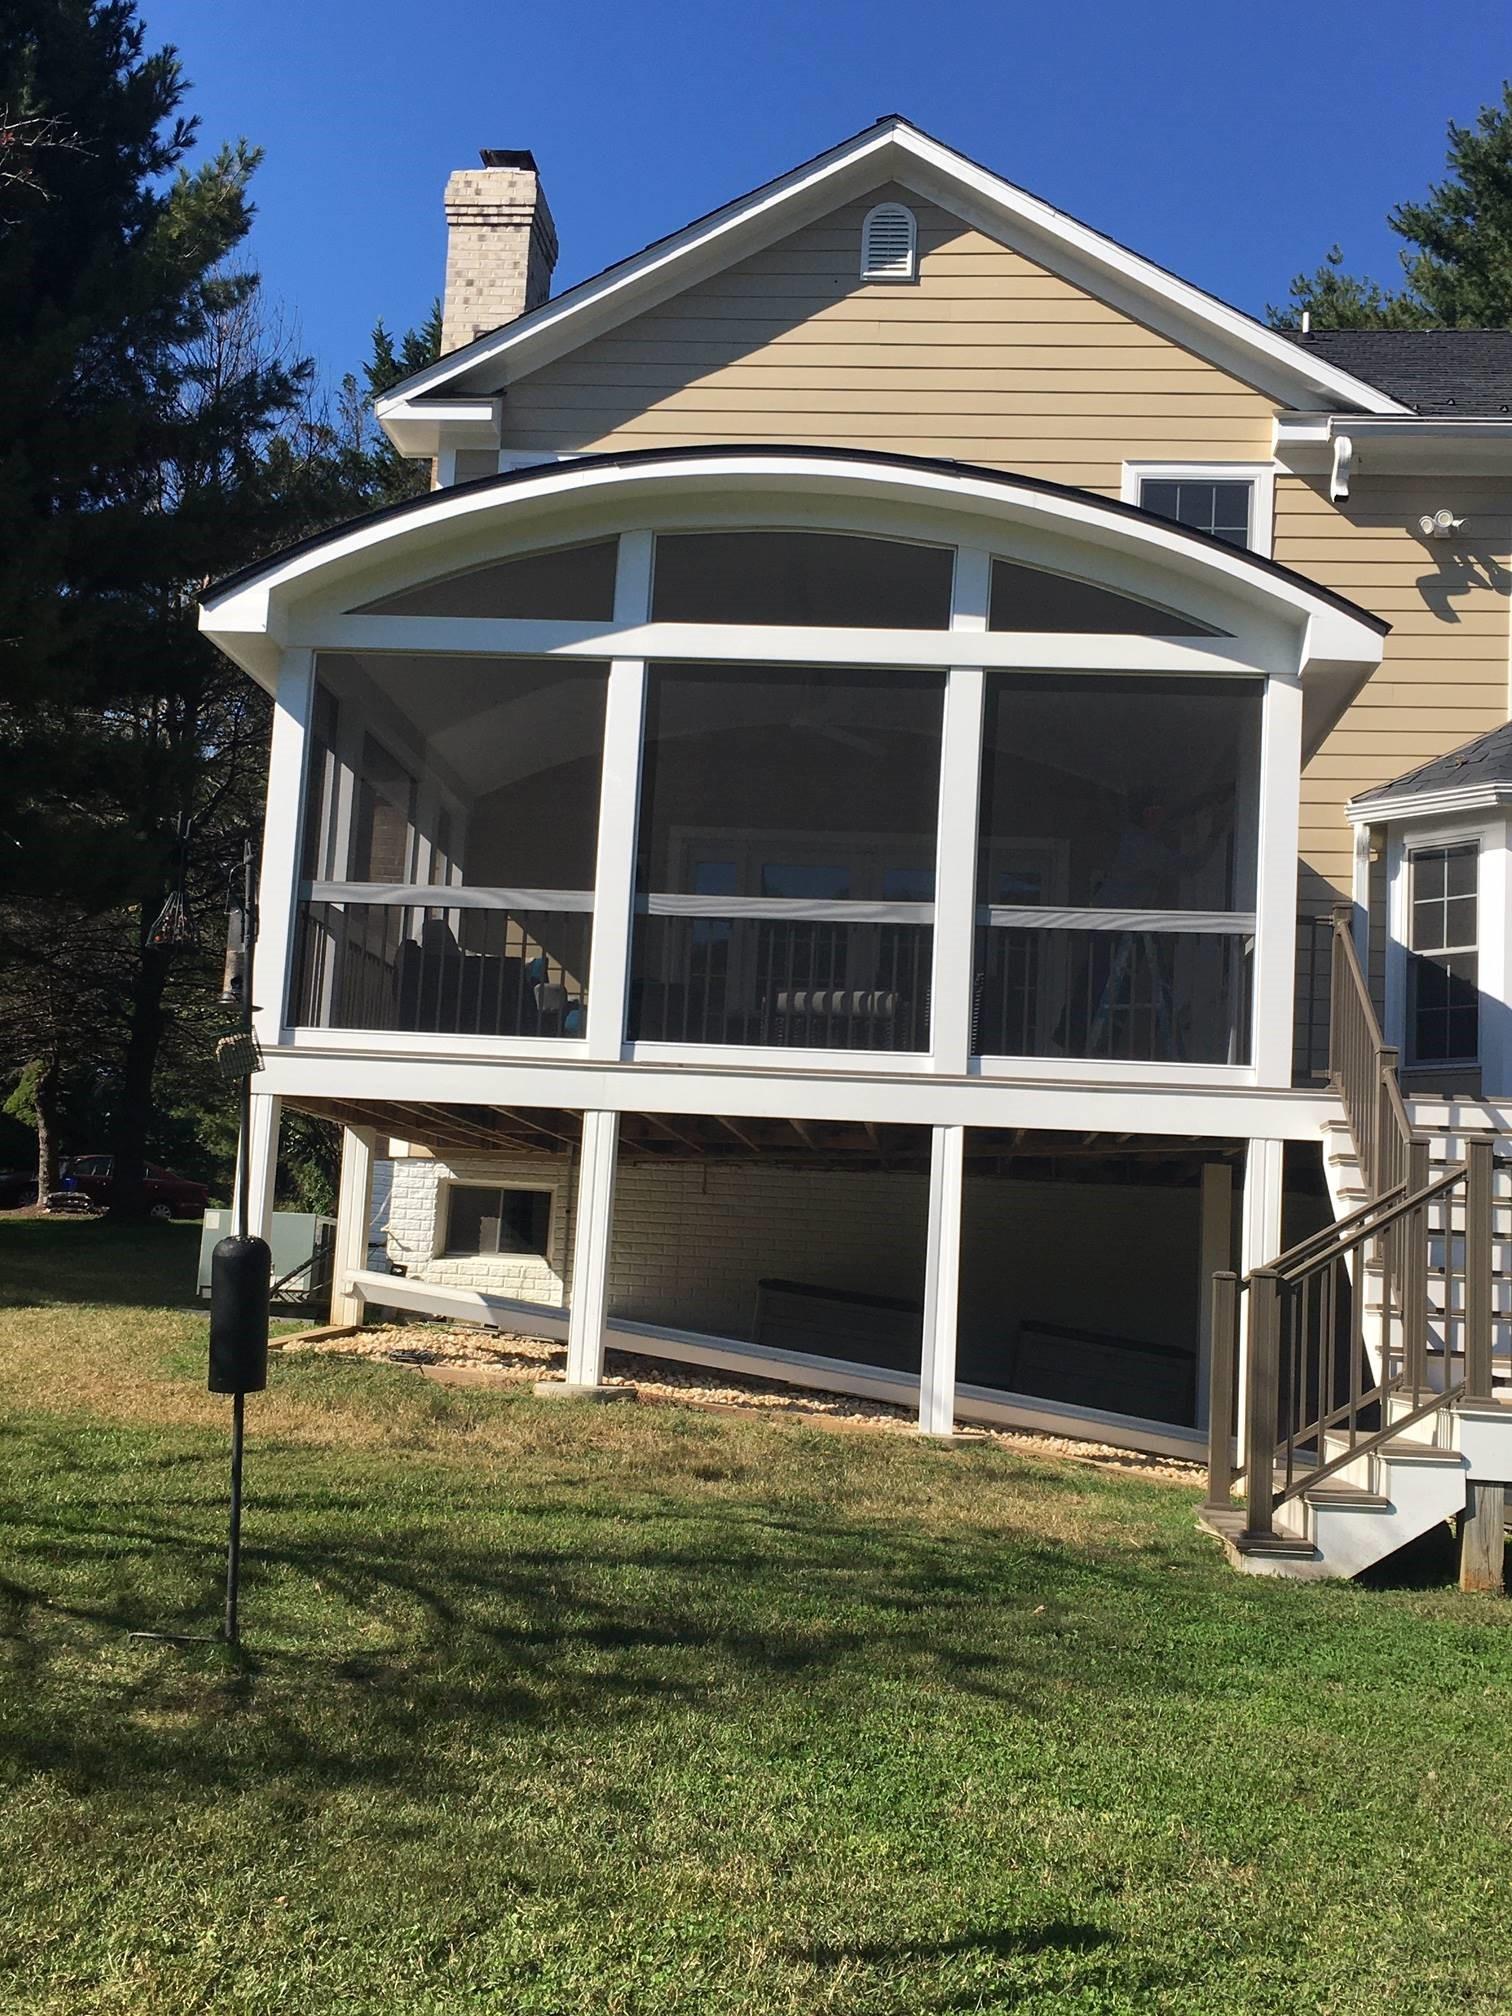 2nd Story Addition & Interior Renovations